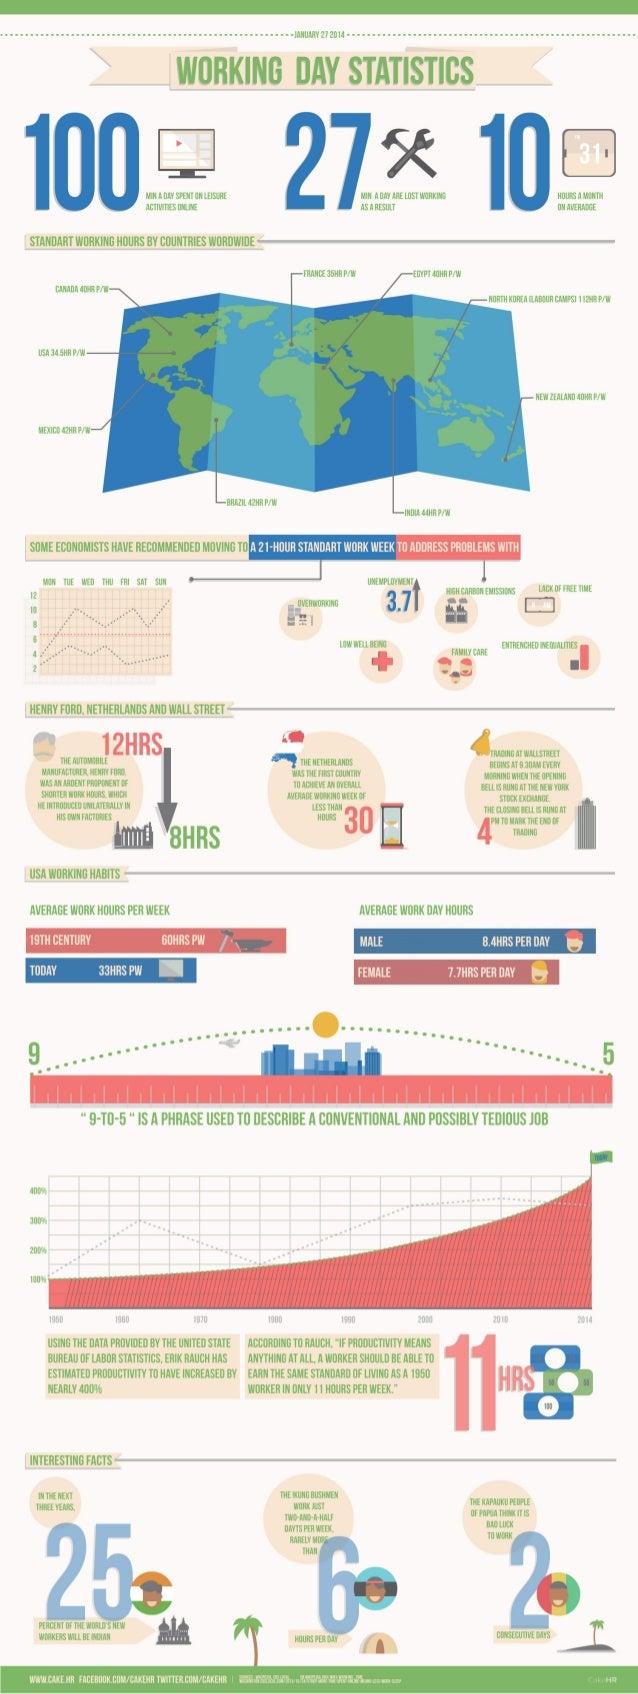 Working Day Statistics